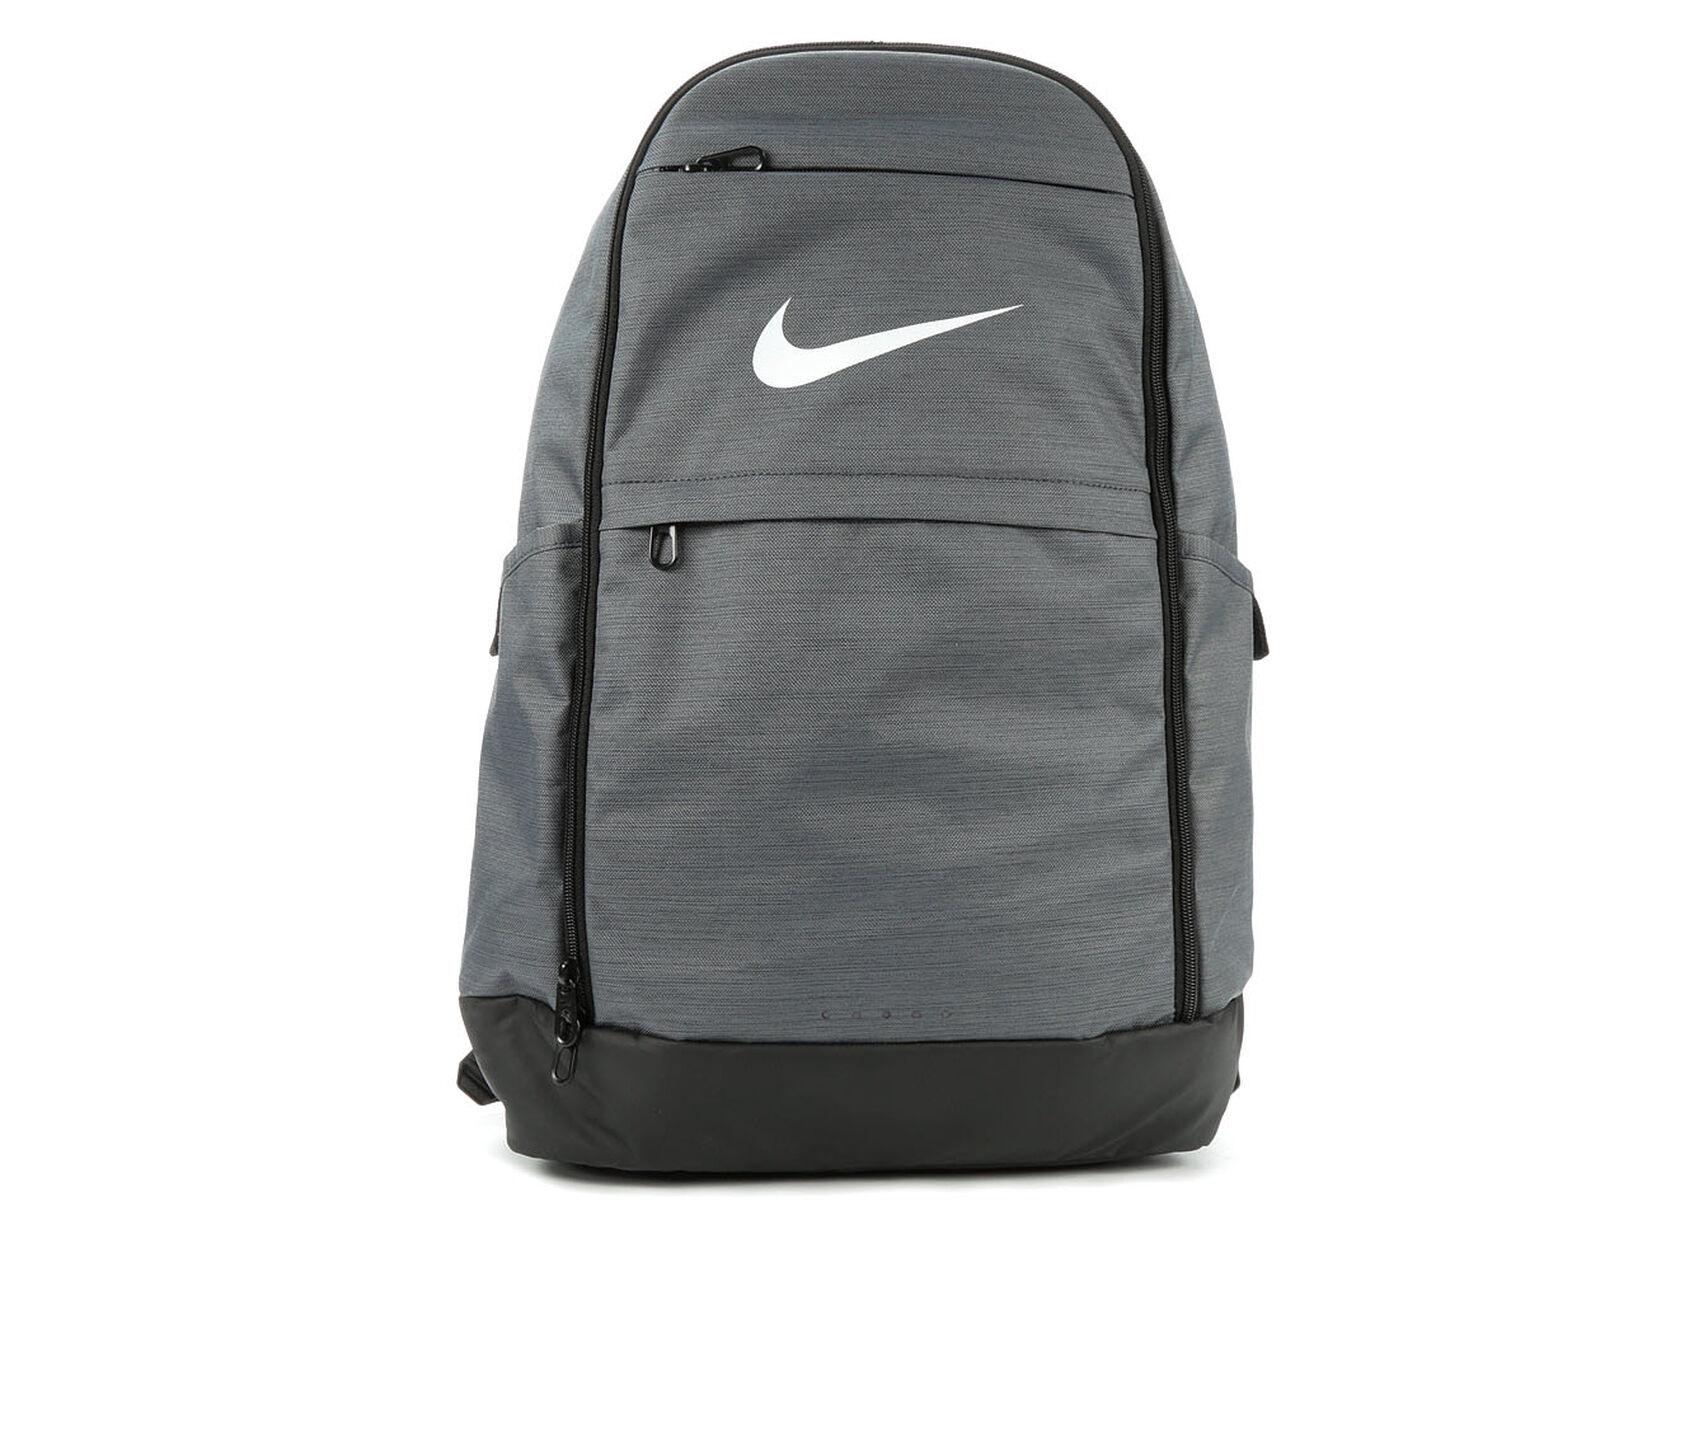 990ceae31d1c Nike Brasilia XL Backpack. Carousel Controls